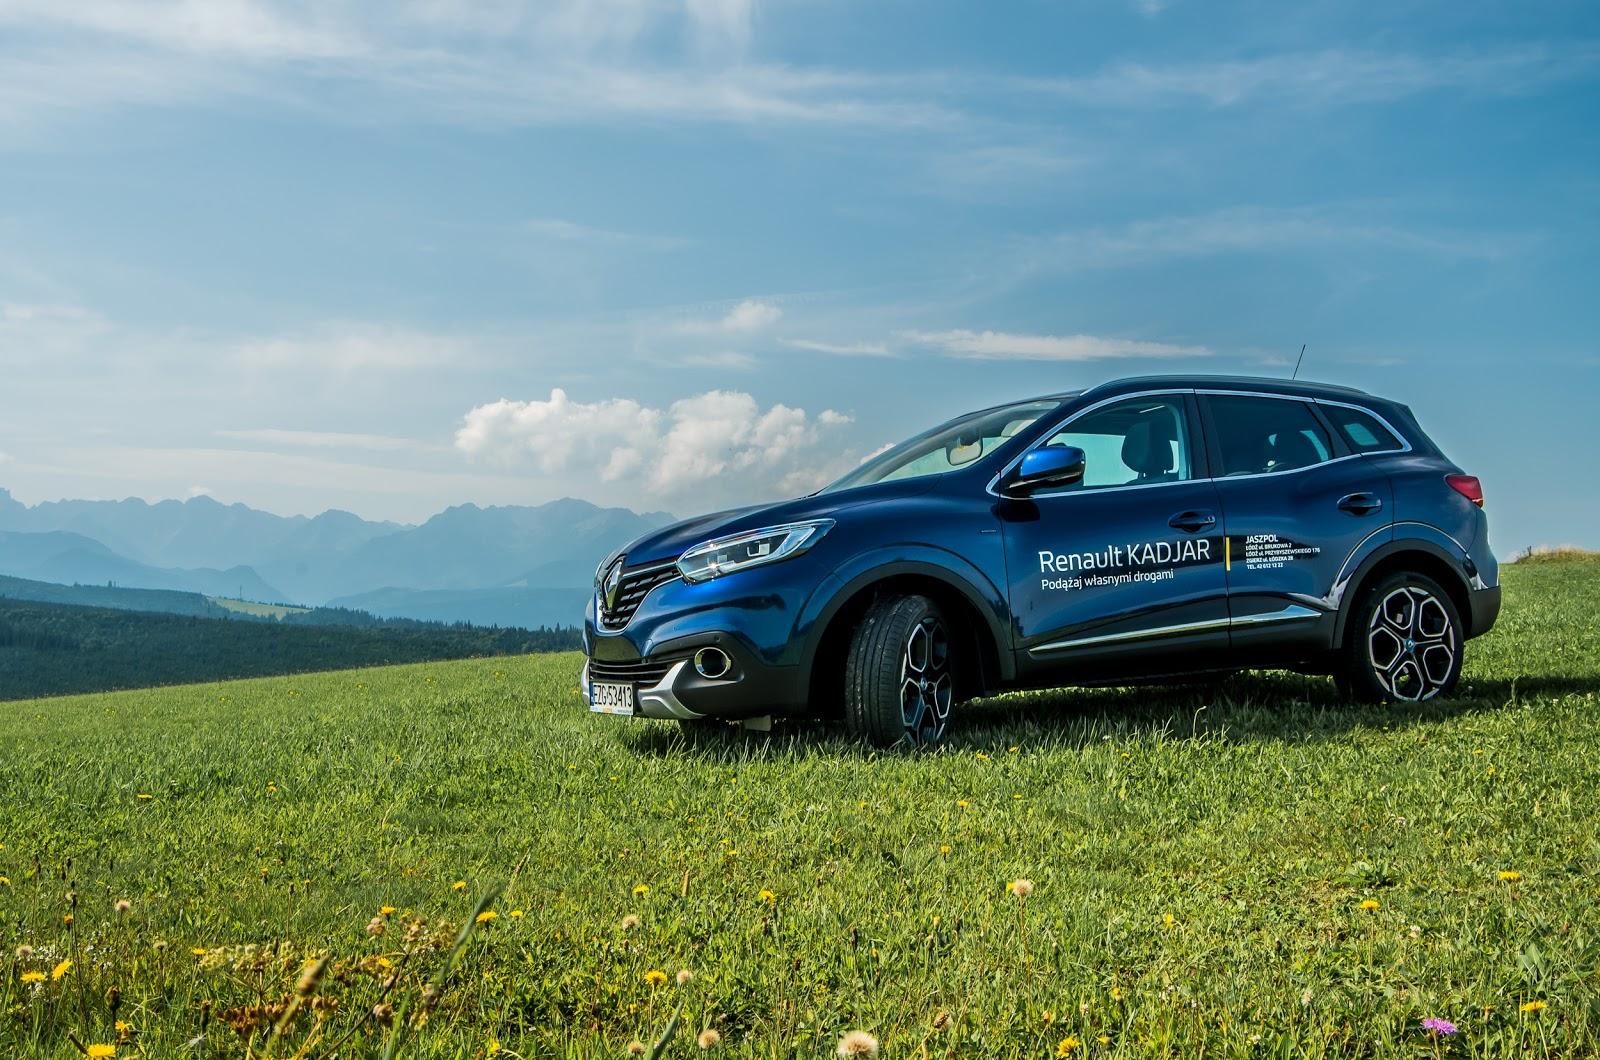 Jaszpol Renault